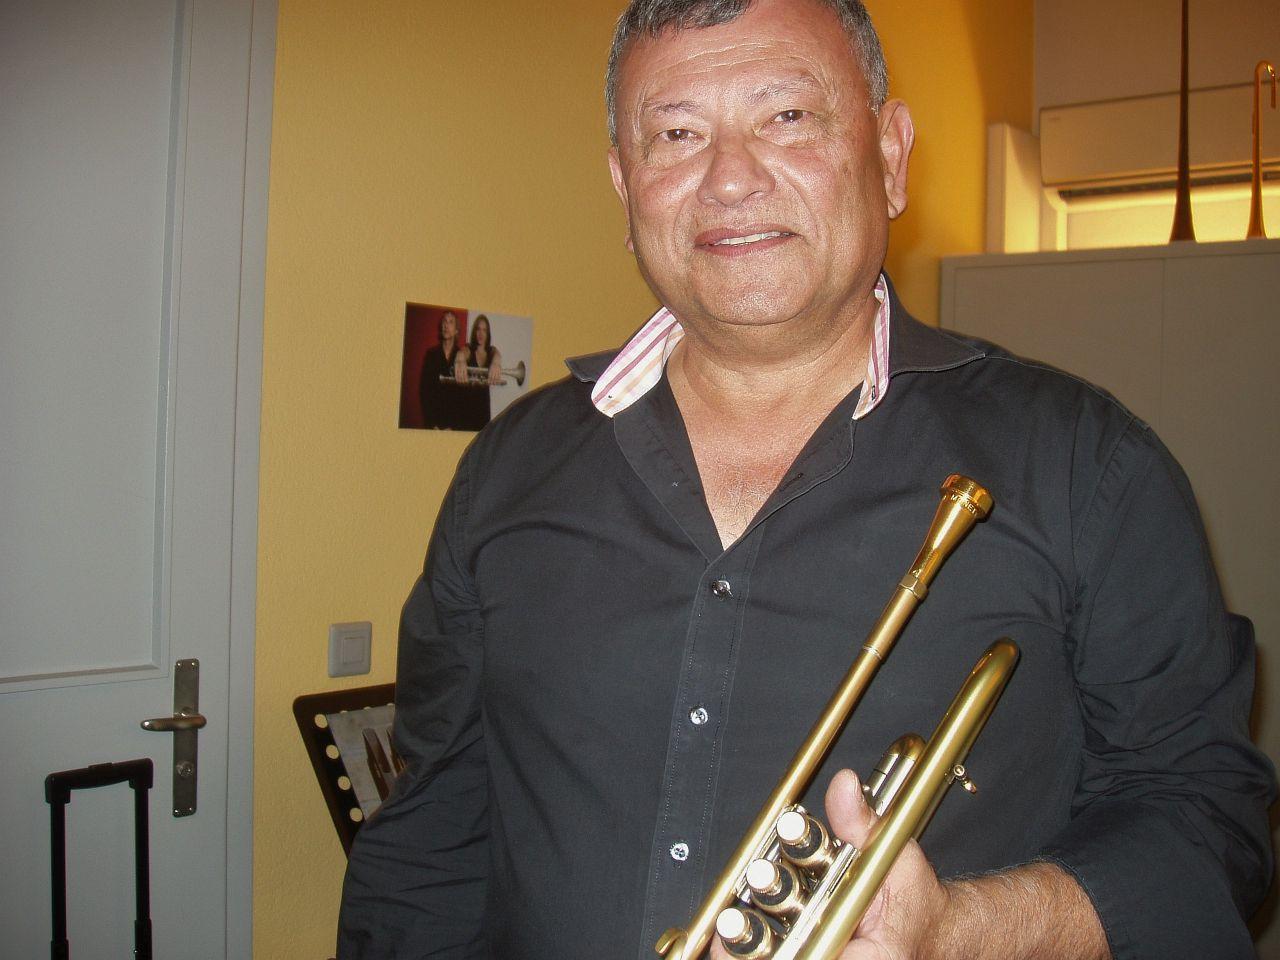 Musiker 139